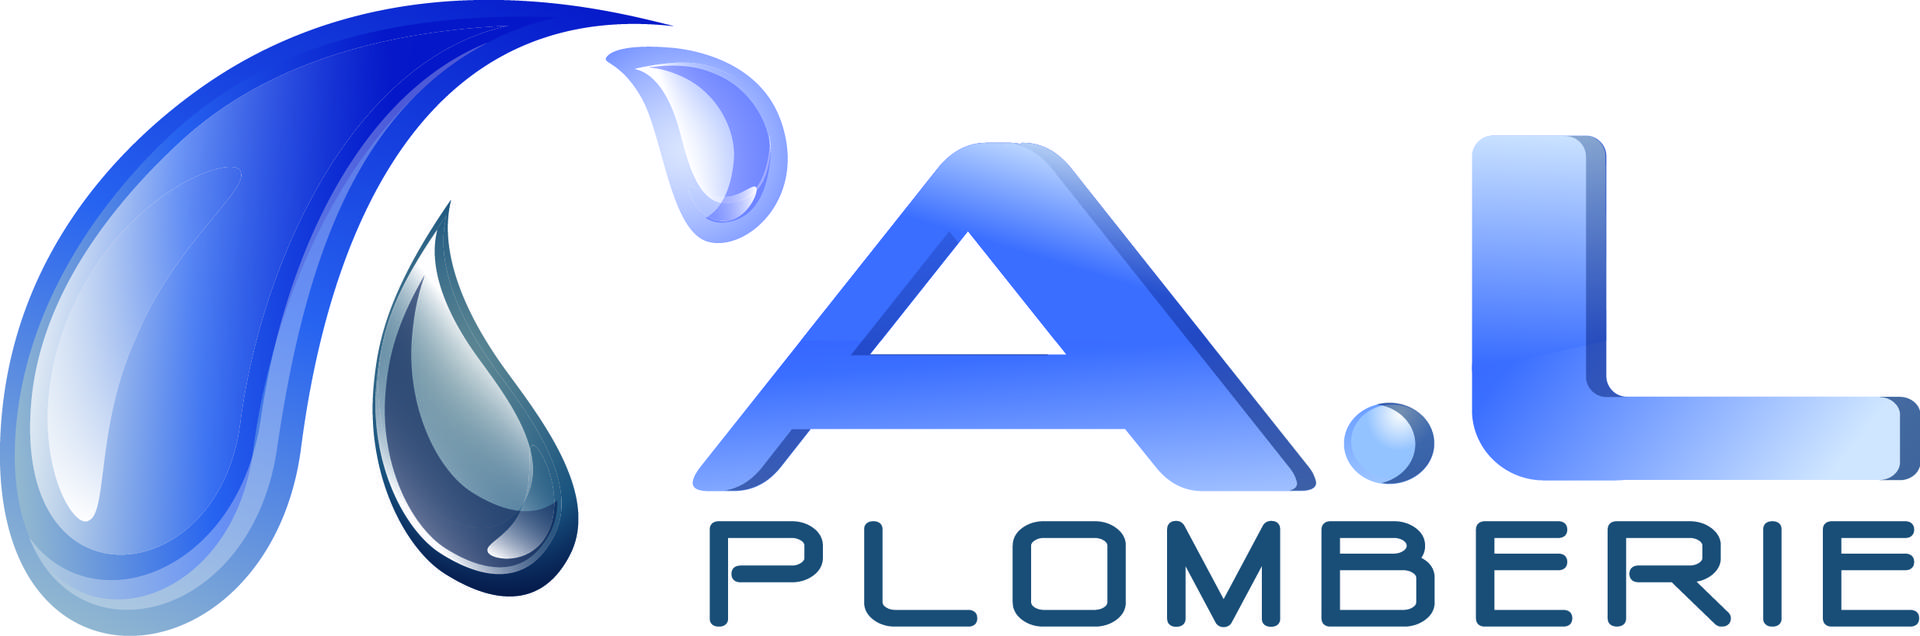 A.L. Plomberie plombier